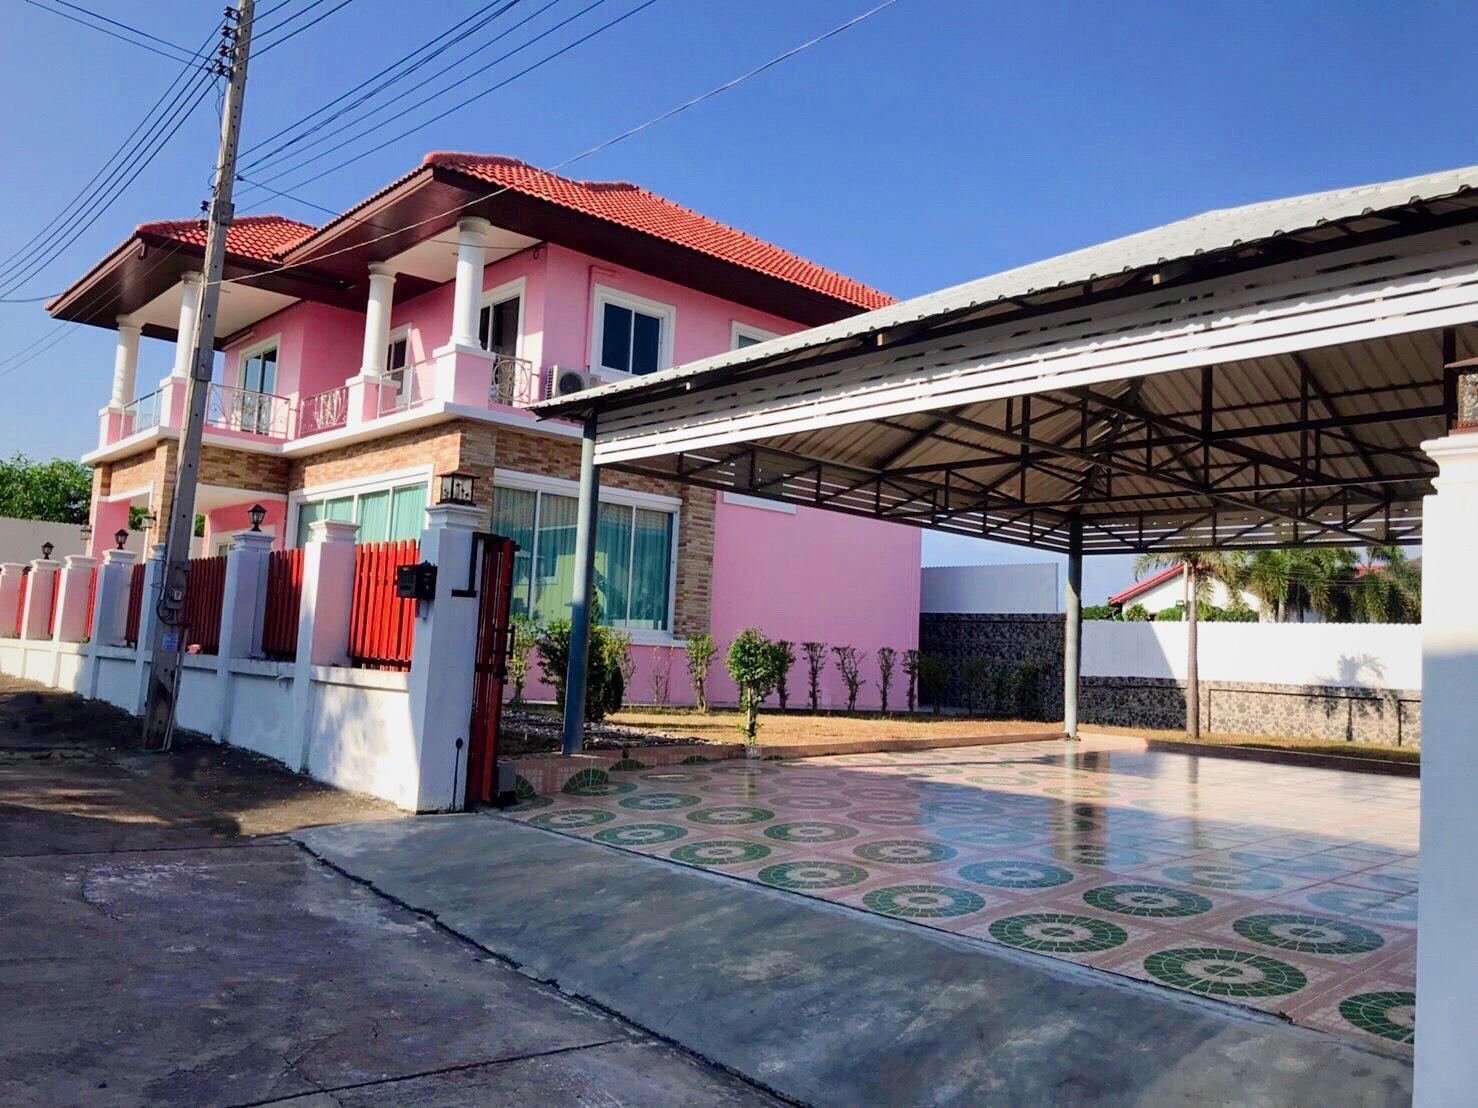 Pink Charm @ Pattaya บ้านเดี่ยว 3 ห้องนอน 3 ห้องน้ำส่วนตัว ขนาด 480 ตร.ม. – บางละมุง